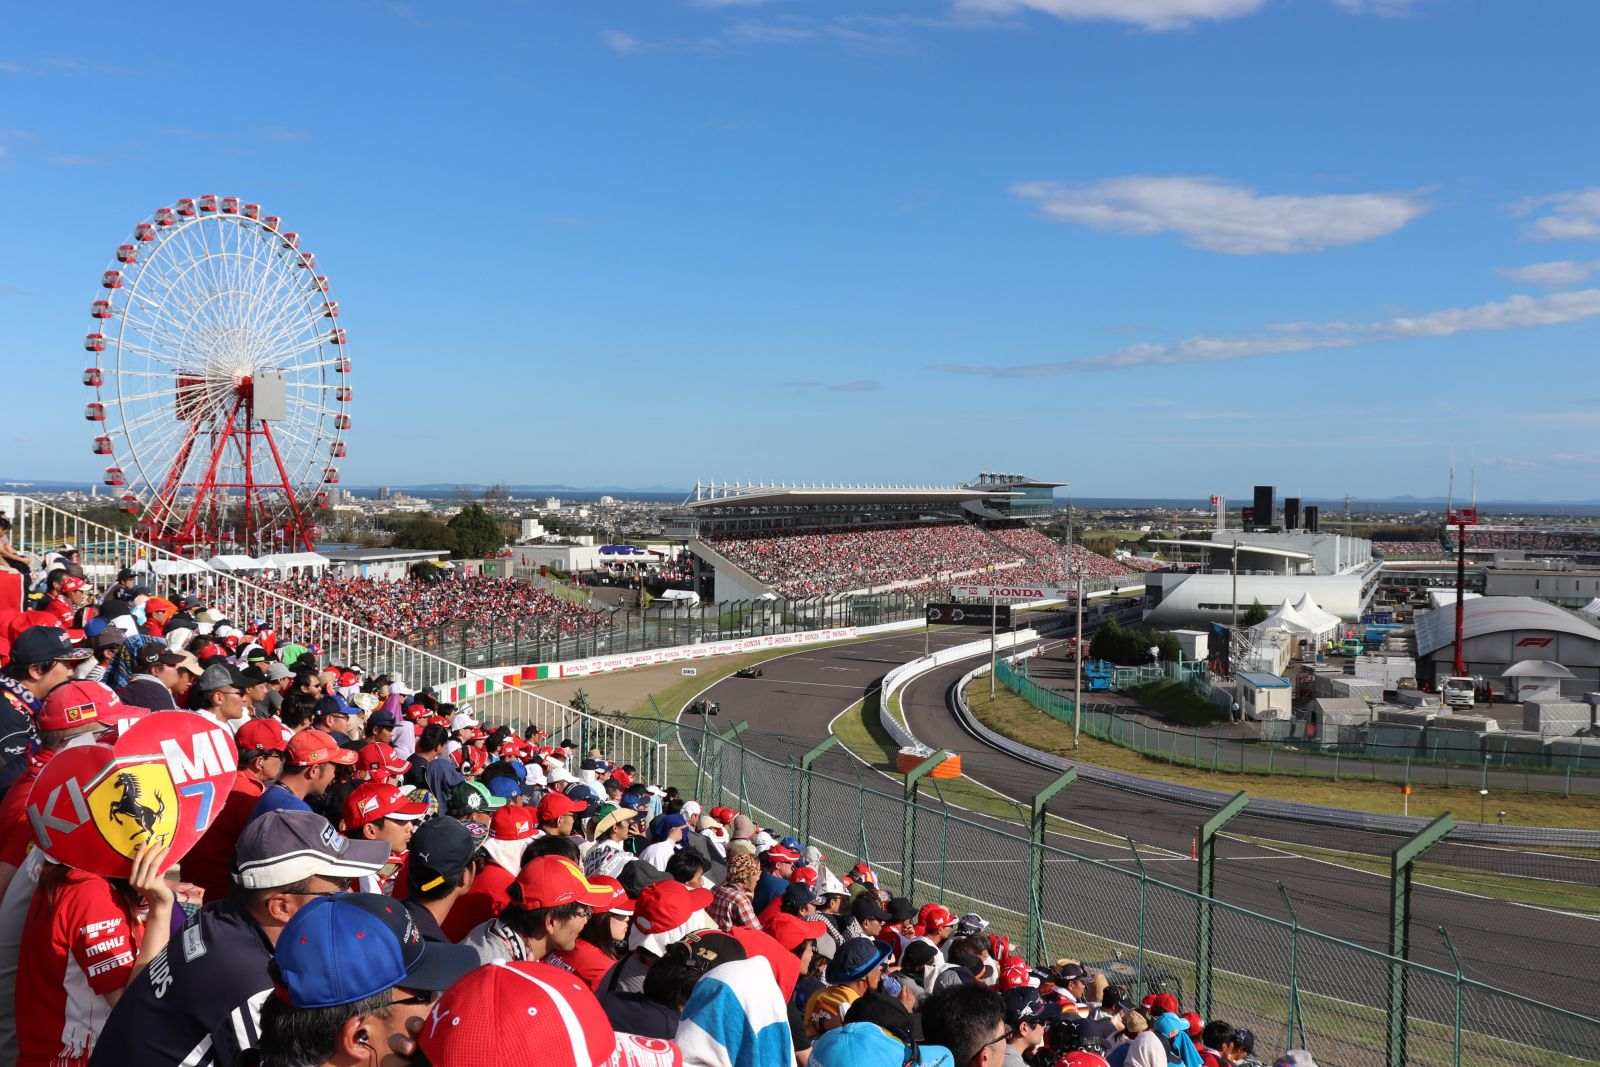 2019 F1日本大獎賽10月舉行 各國賽車迷搶進鈴鹿賽車場